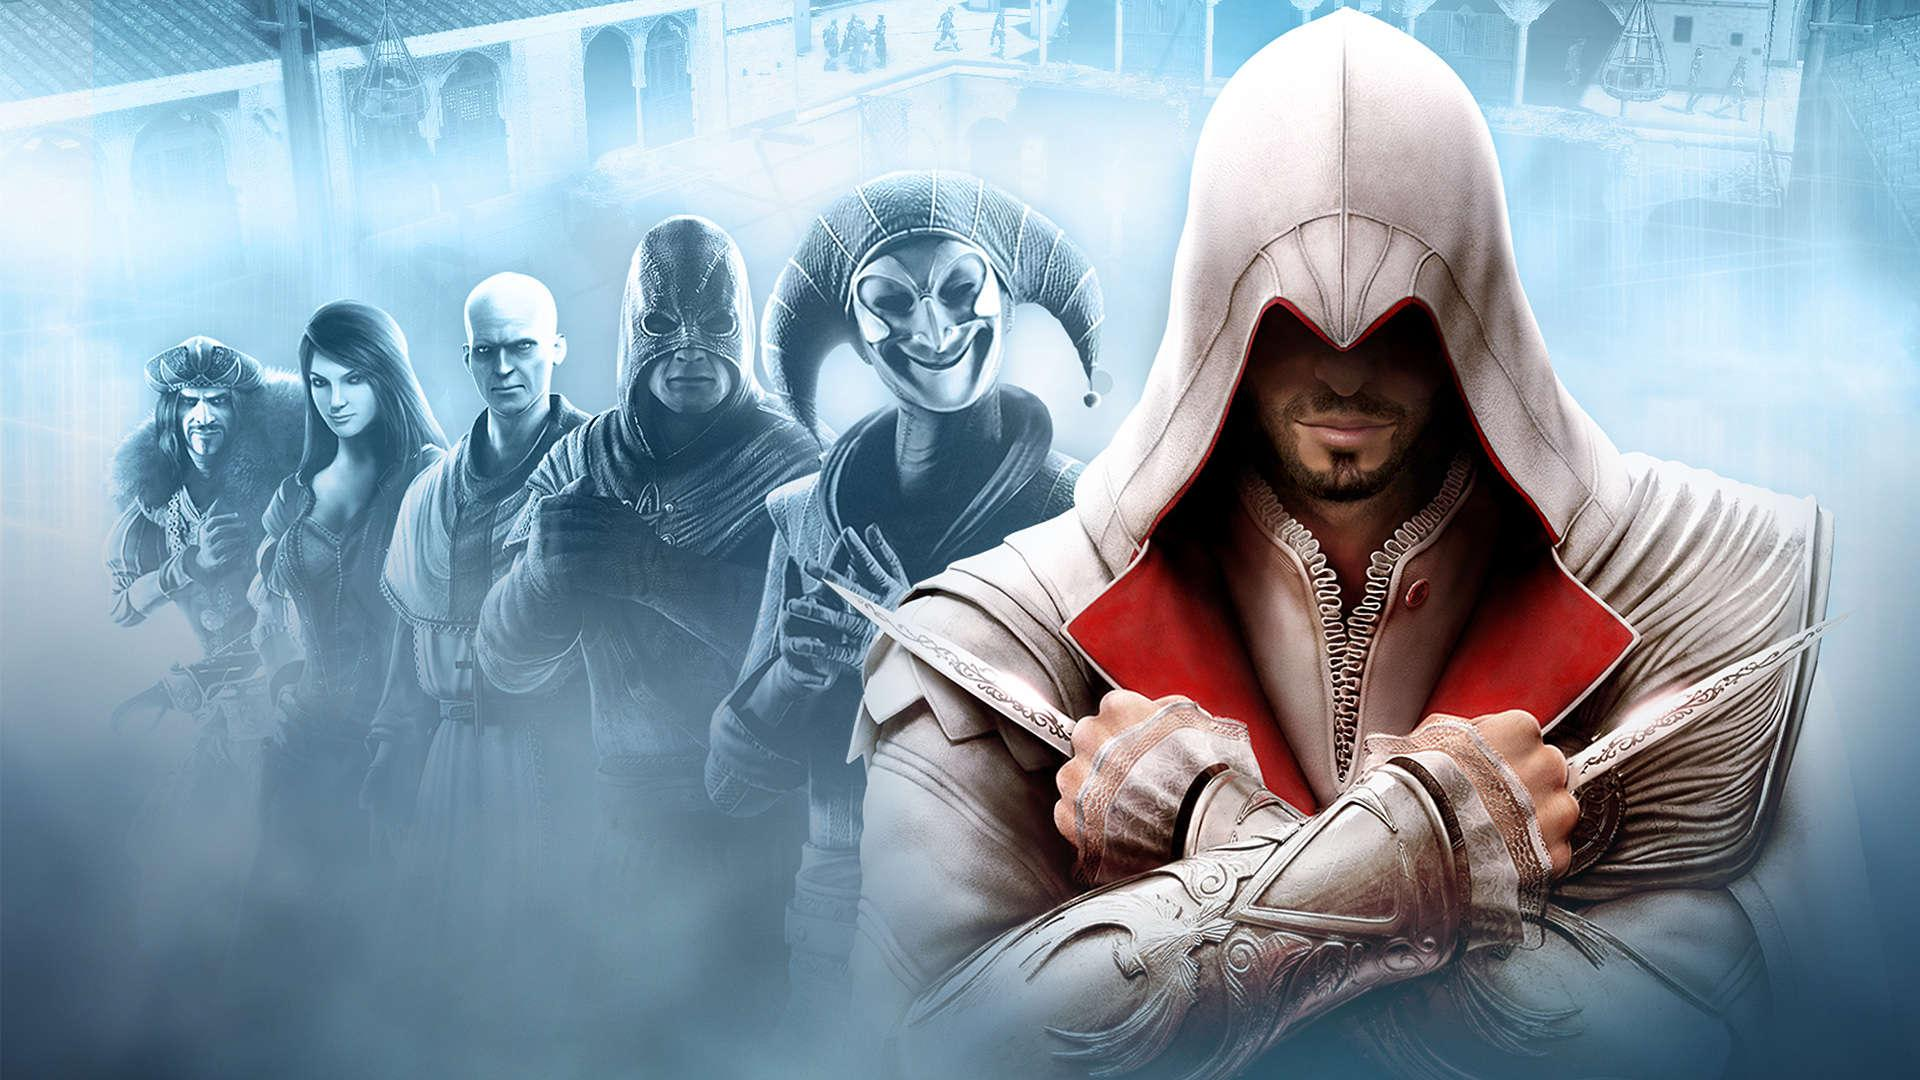 Assassin's Creed HD Wa...